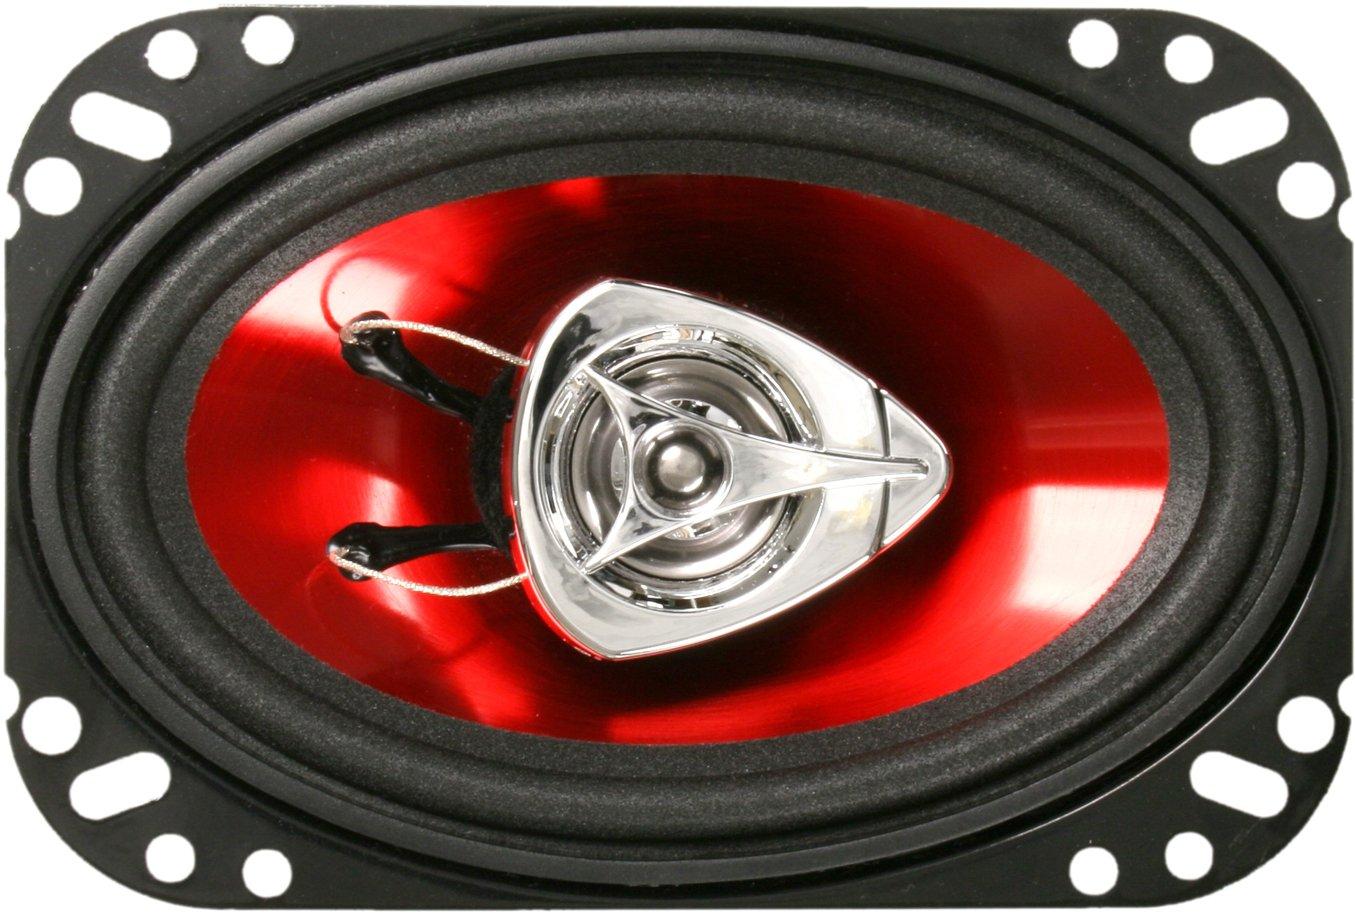 Boss audio Chaos Exxtreme 4'' x 6'' 2-Way 200W Full Range Speaker